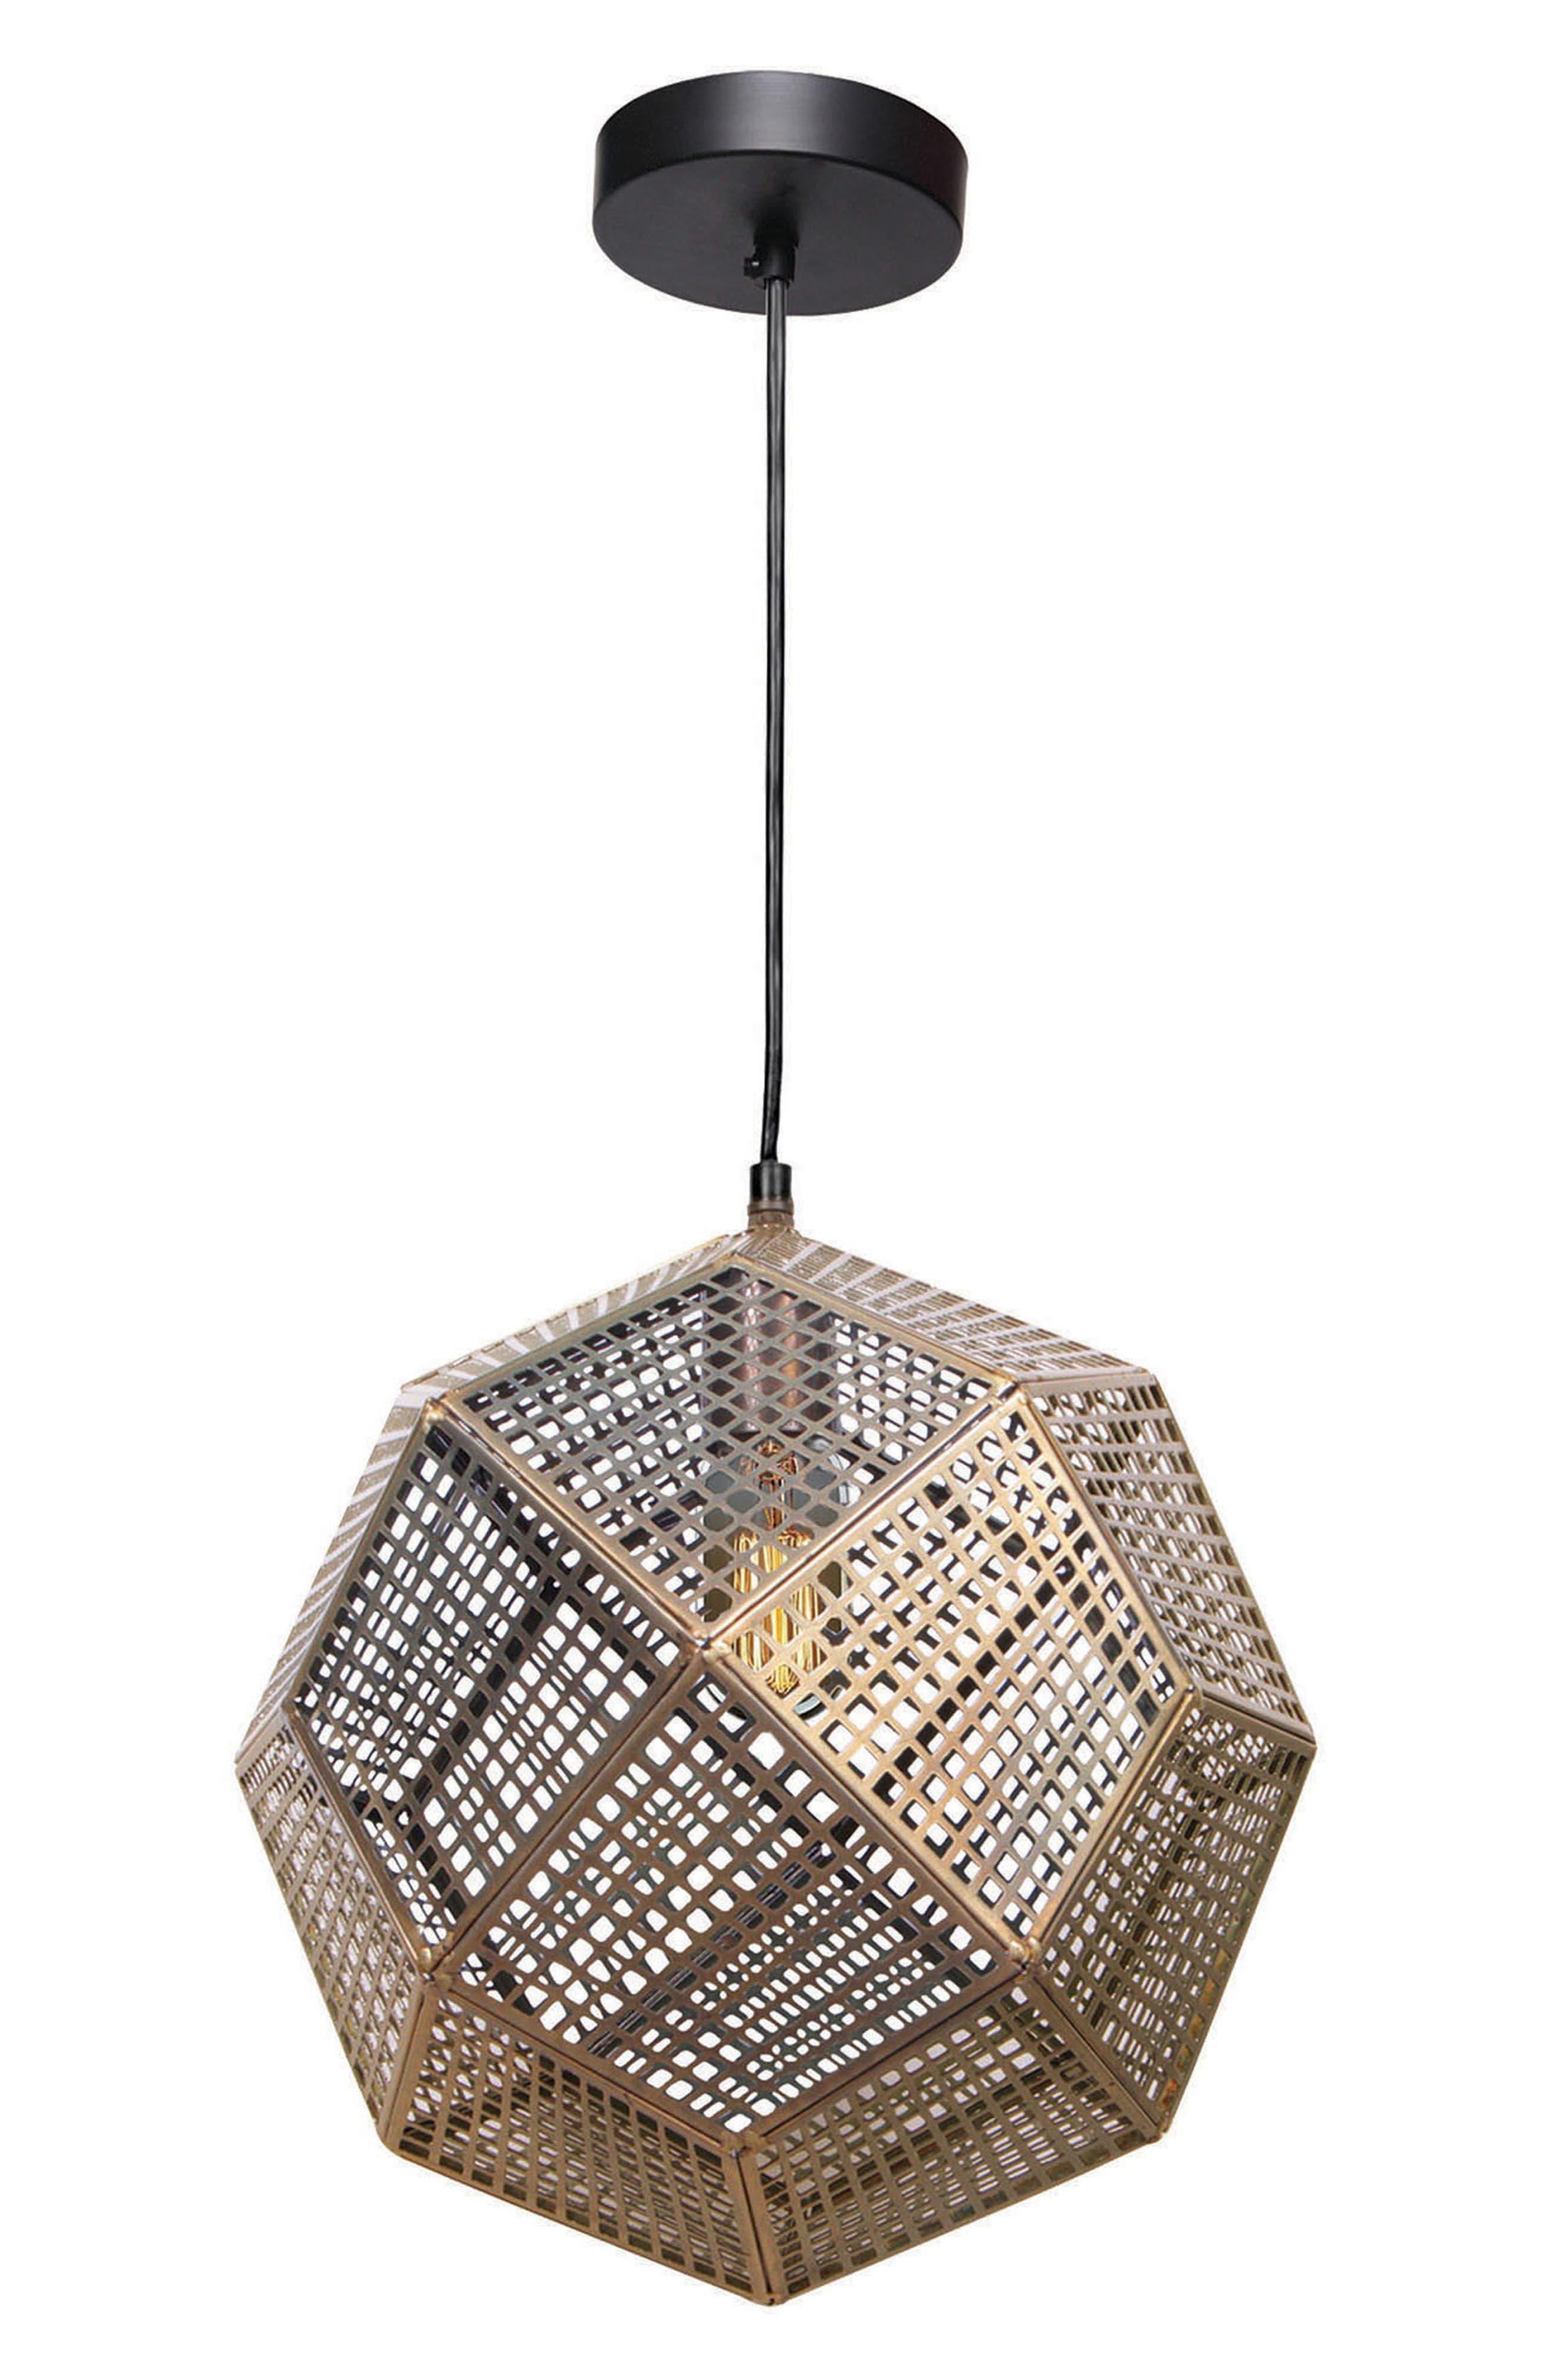 Main Image - Renwil'Skars' Ceiling Light Fixture